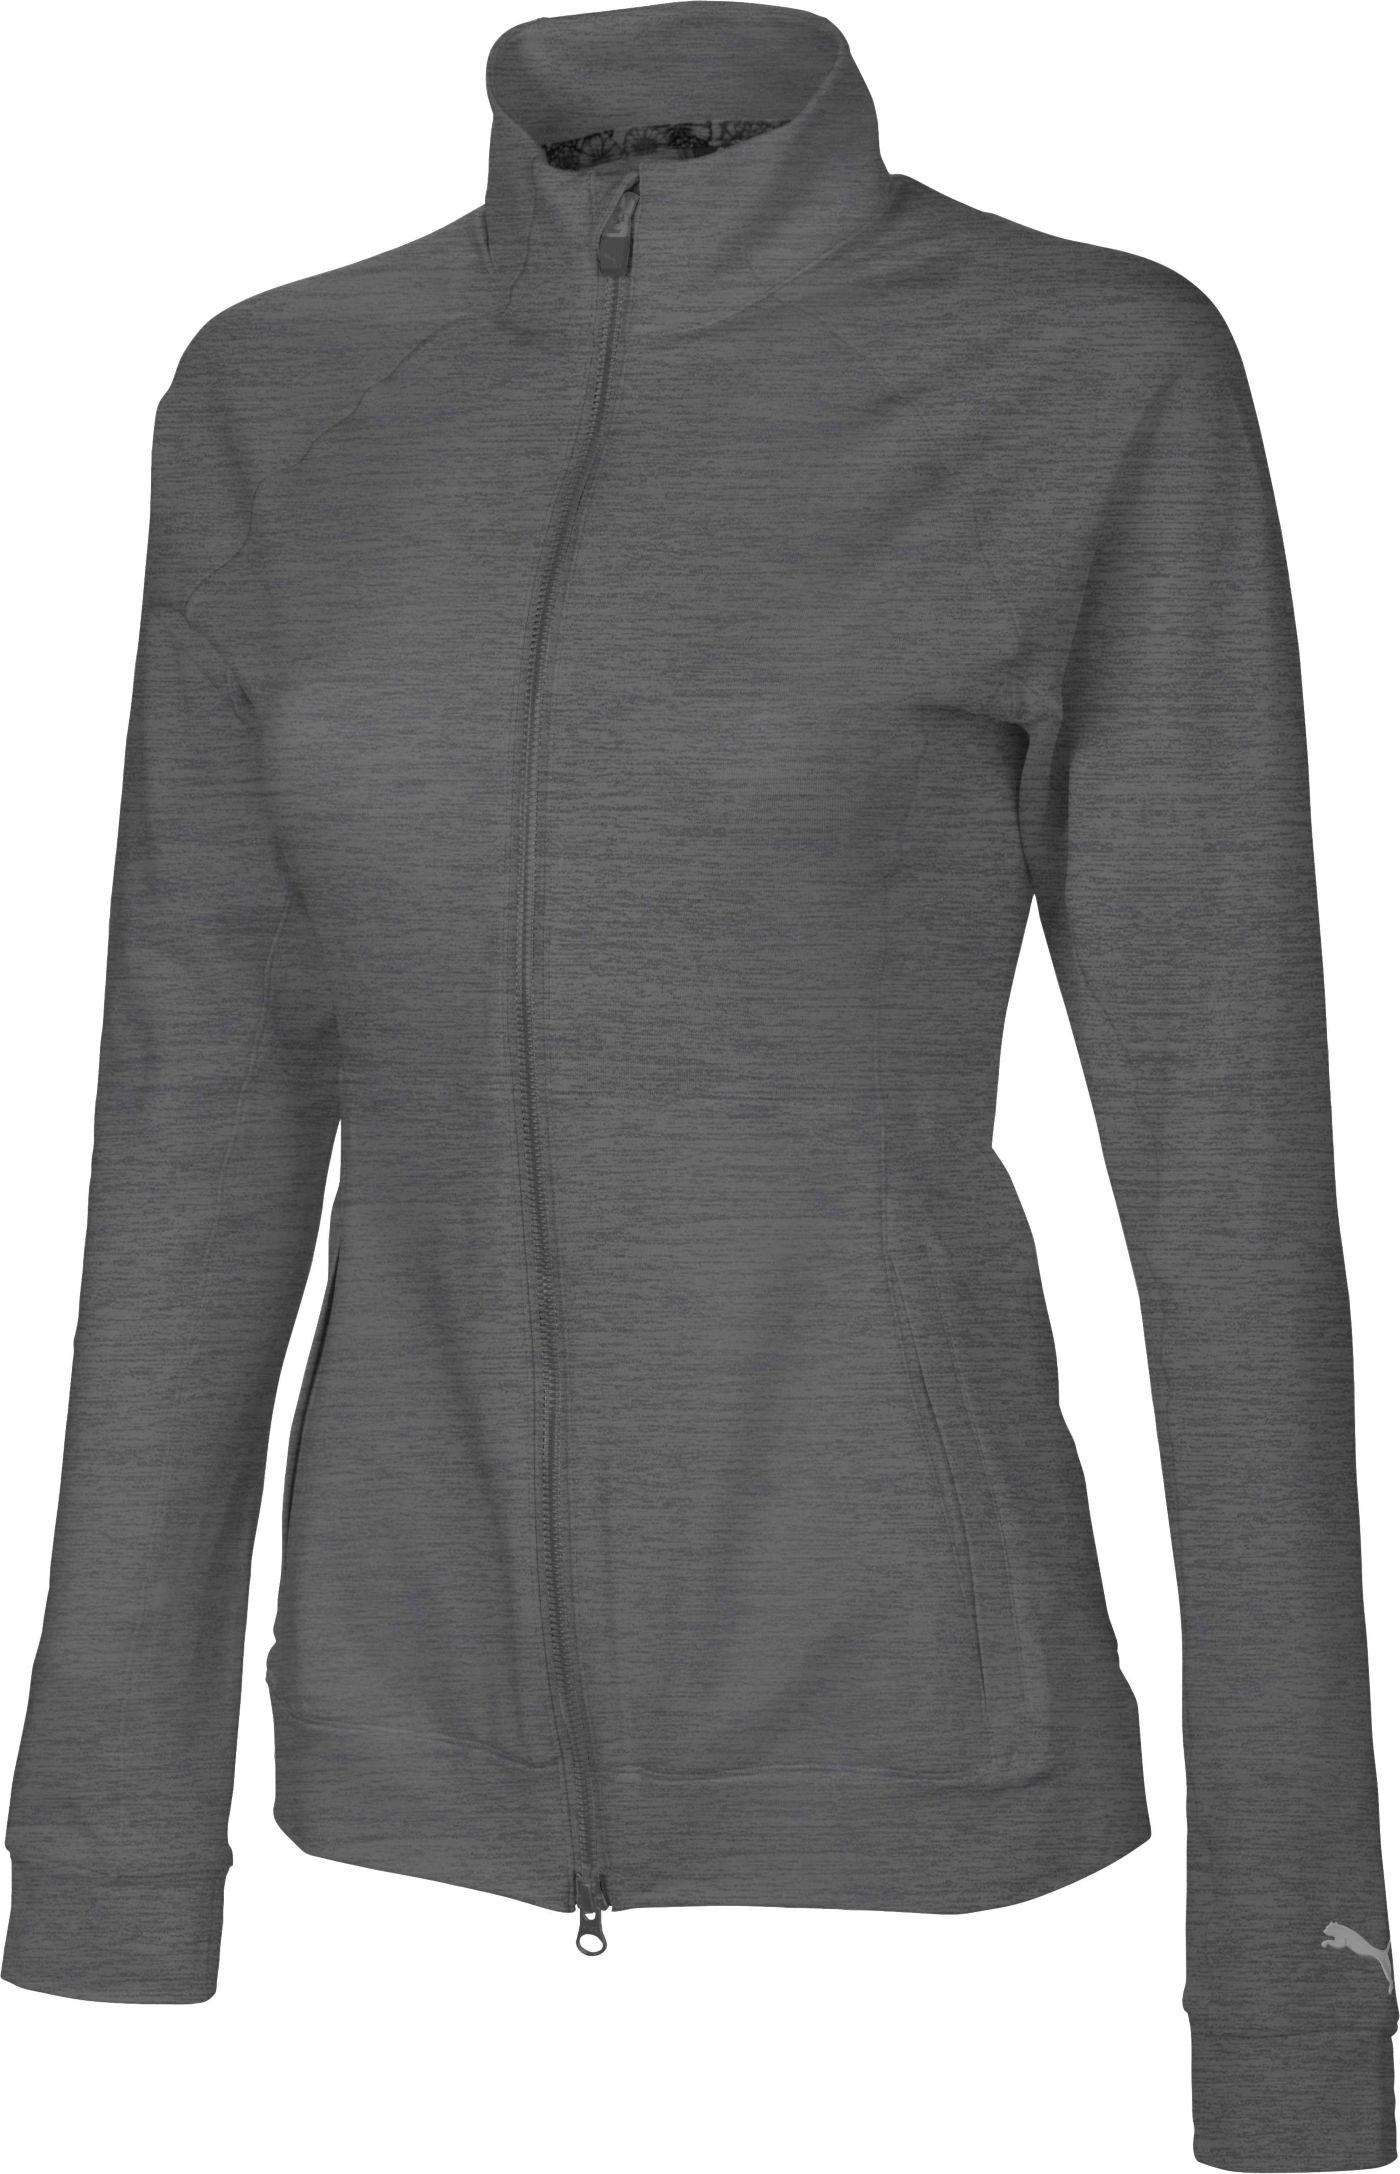 PUMA Women's Vented Full-Zip Golf Jacket